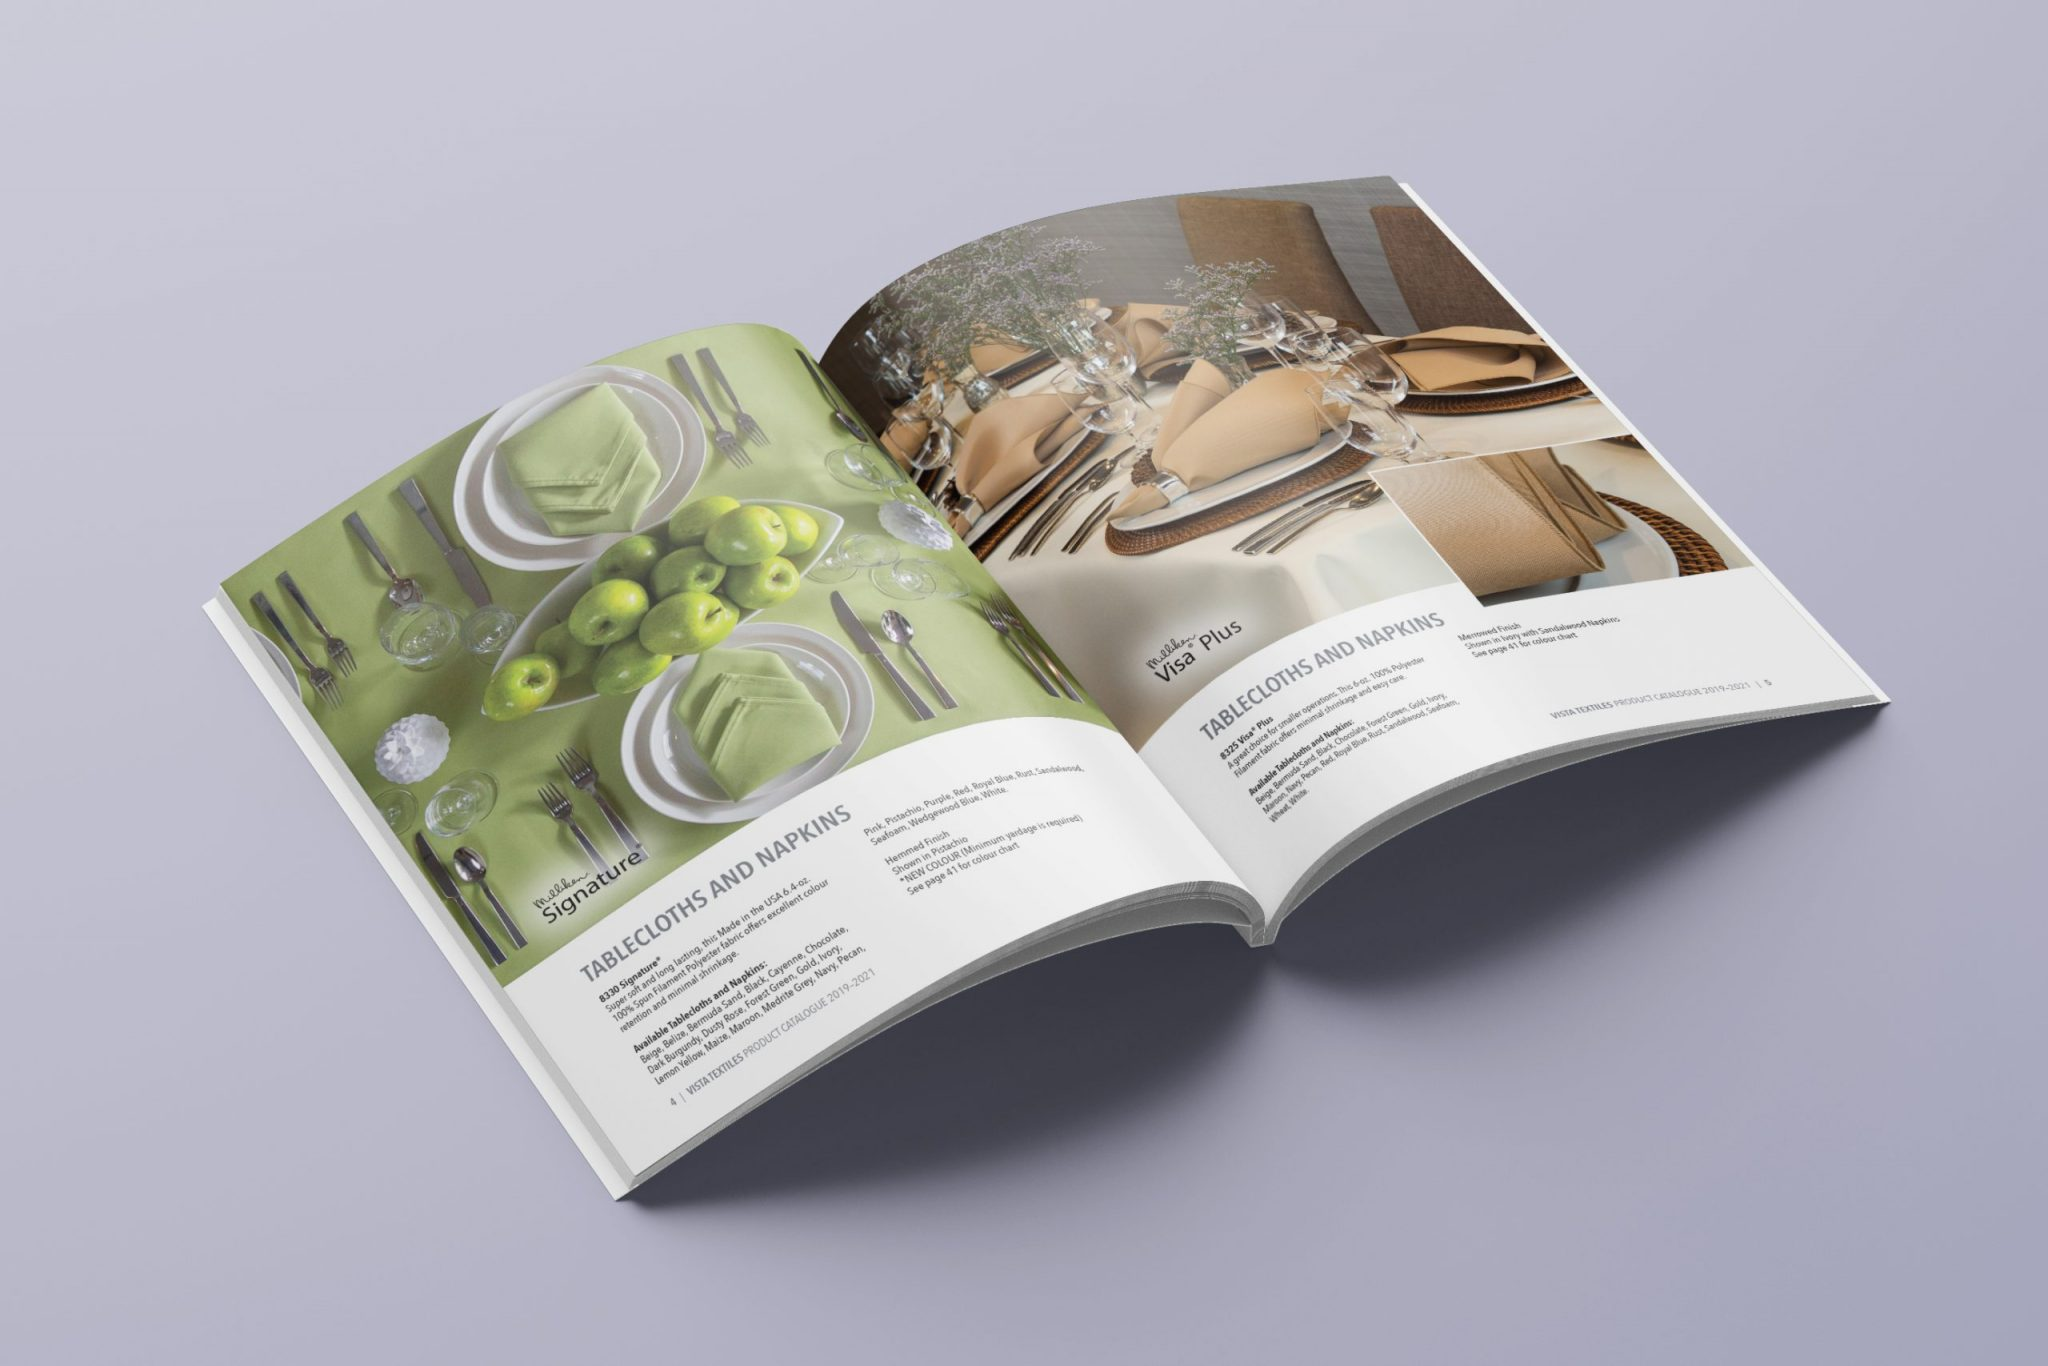 vista-textiles-catalog-spread-1